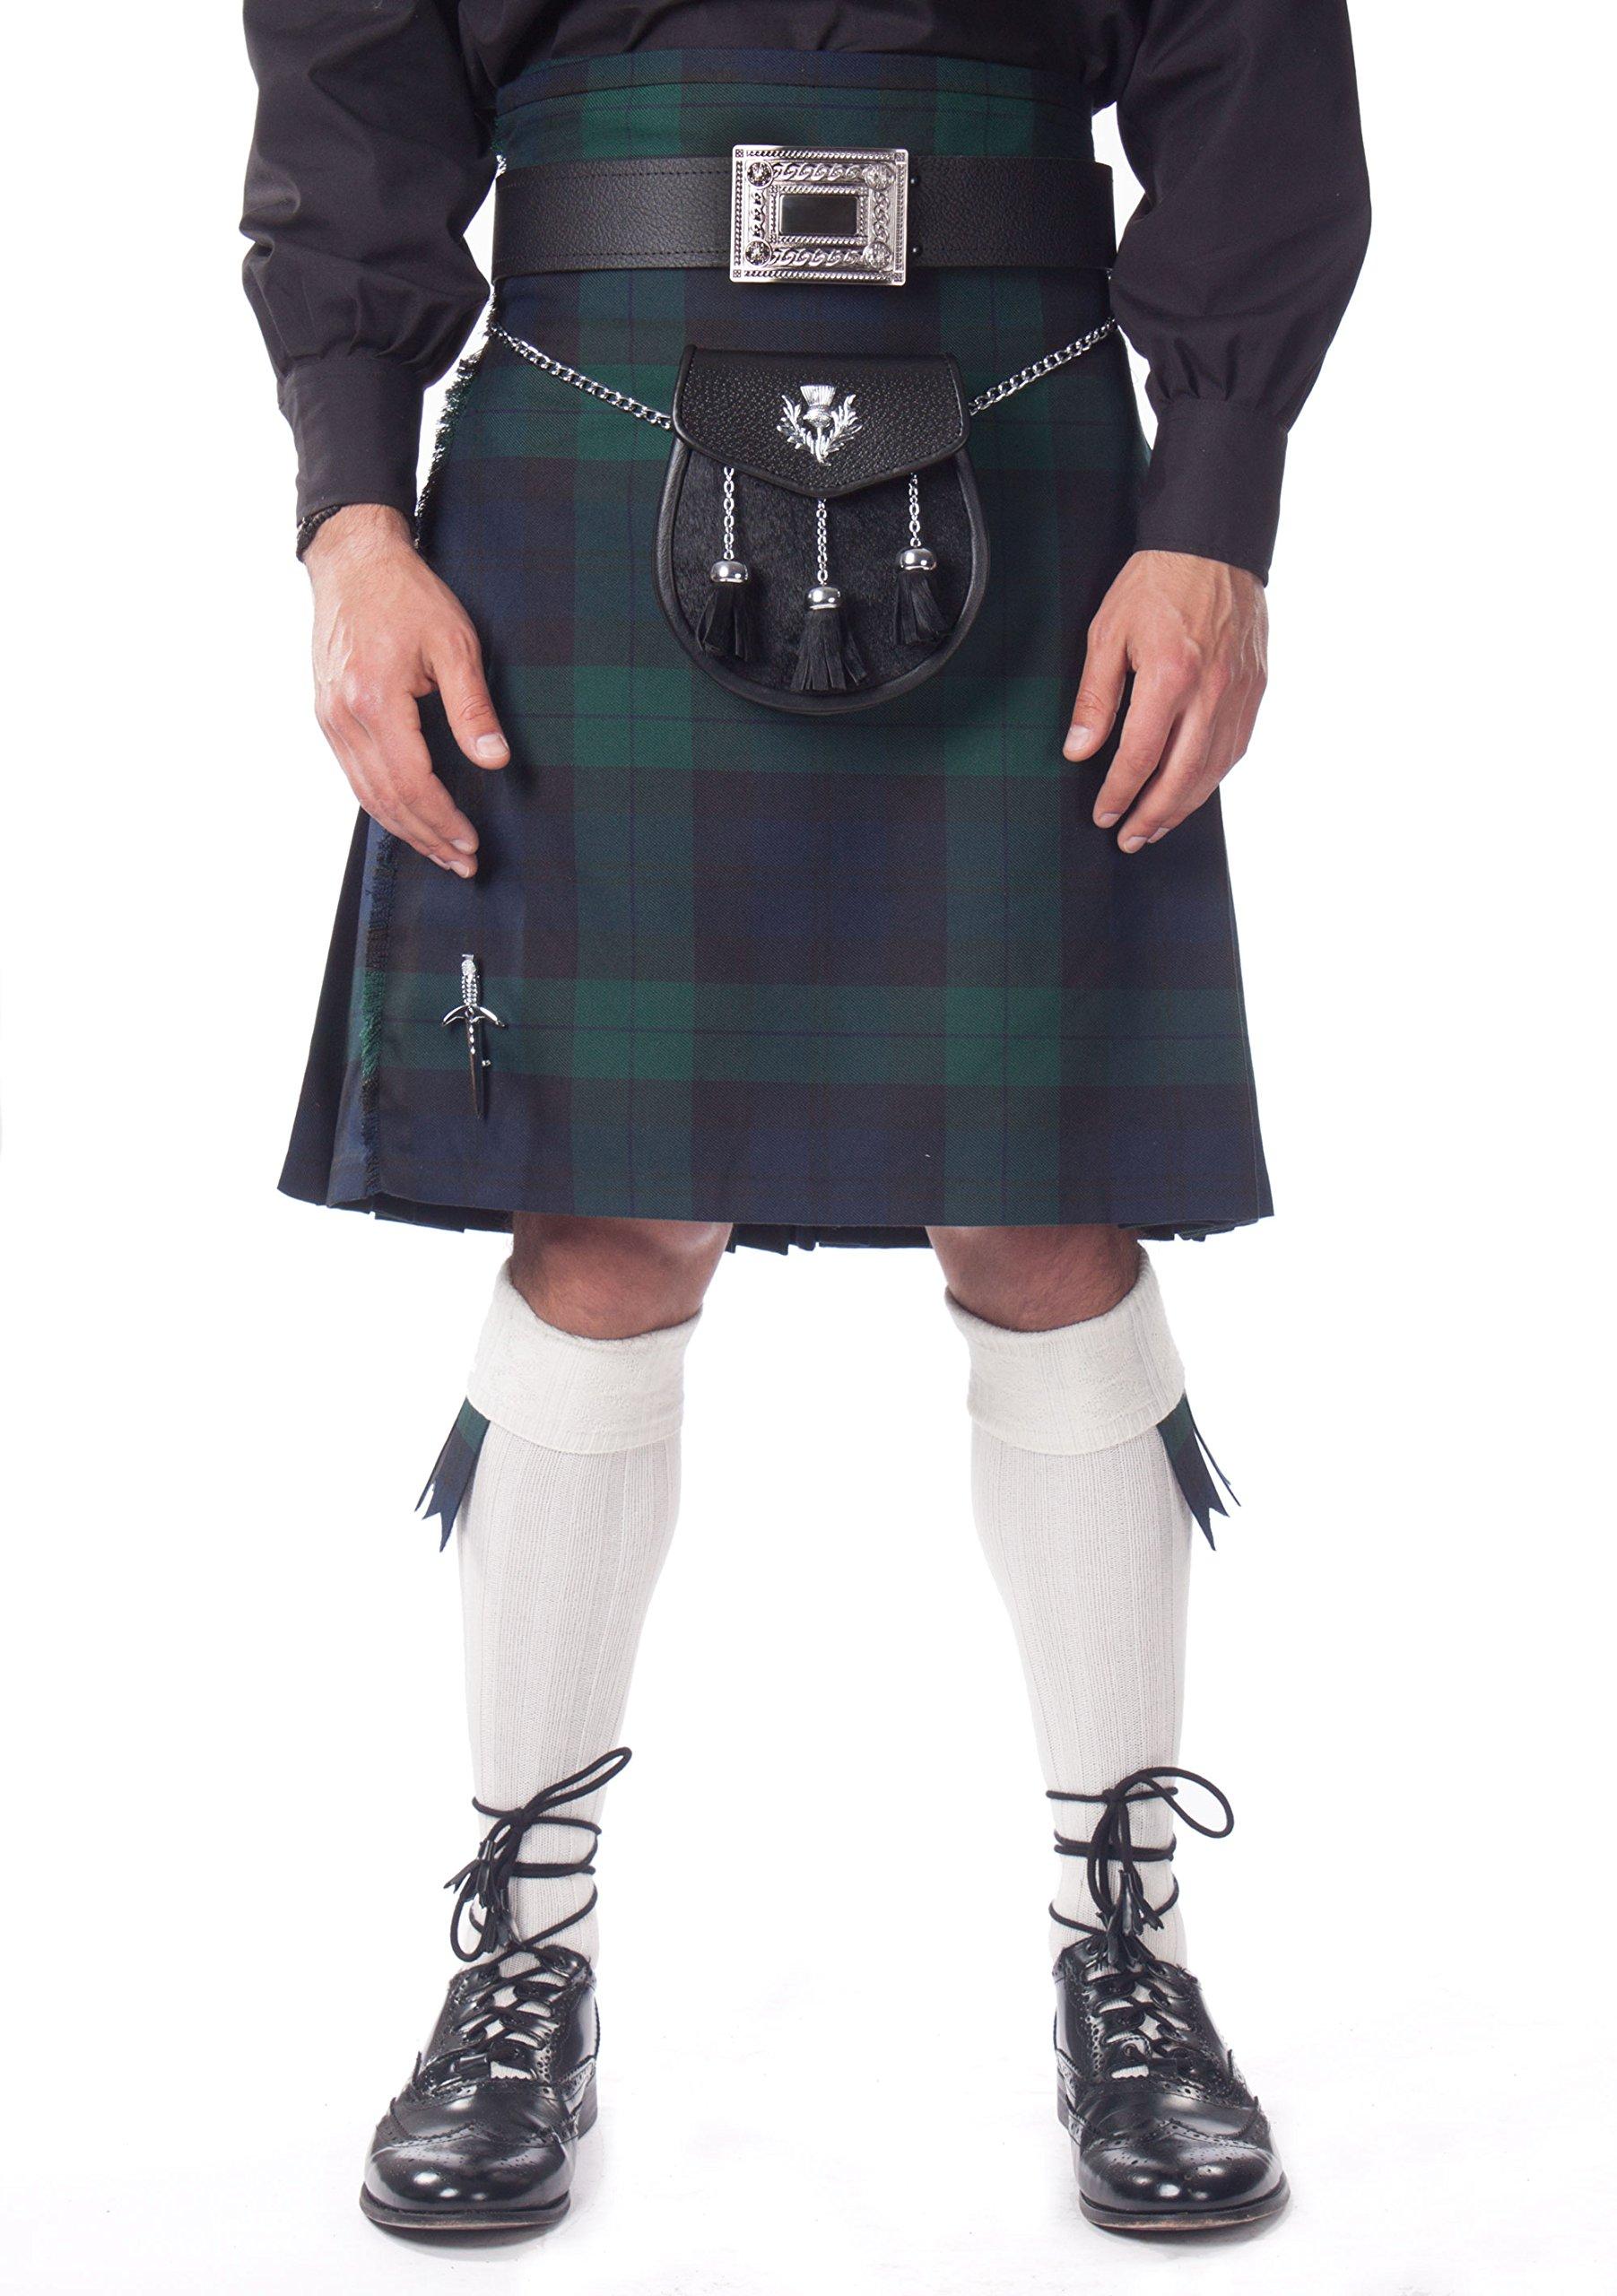 Kilt Society Mens 7 Piece Semi Dress Kilt Outfit- Black Watch Tartan with White Hose 34'' to 38''